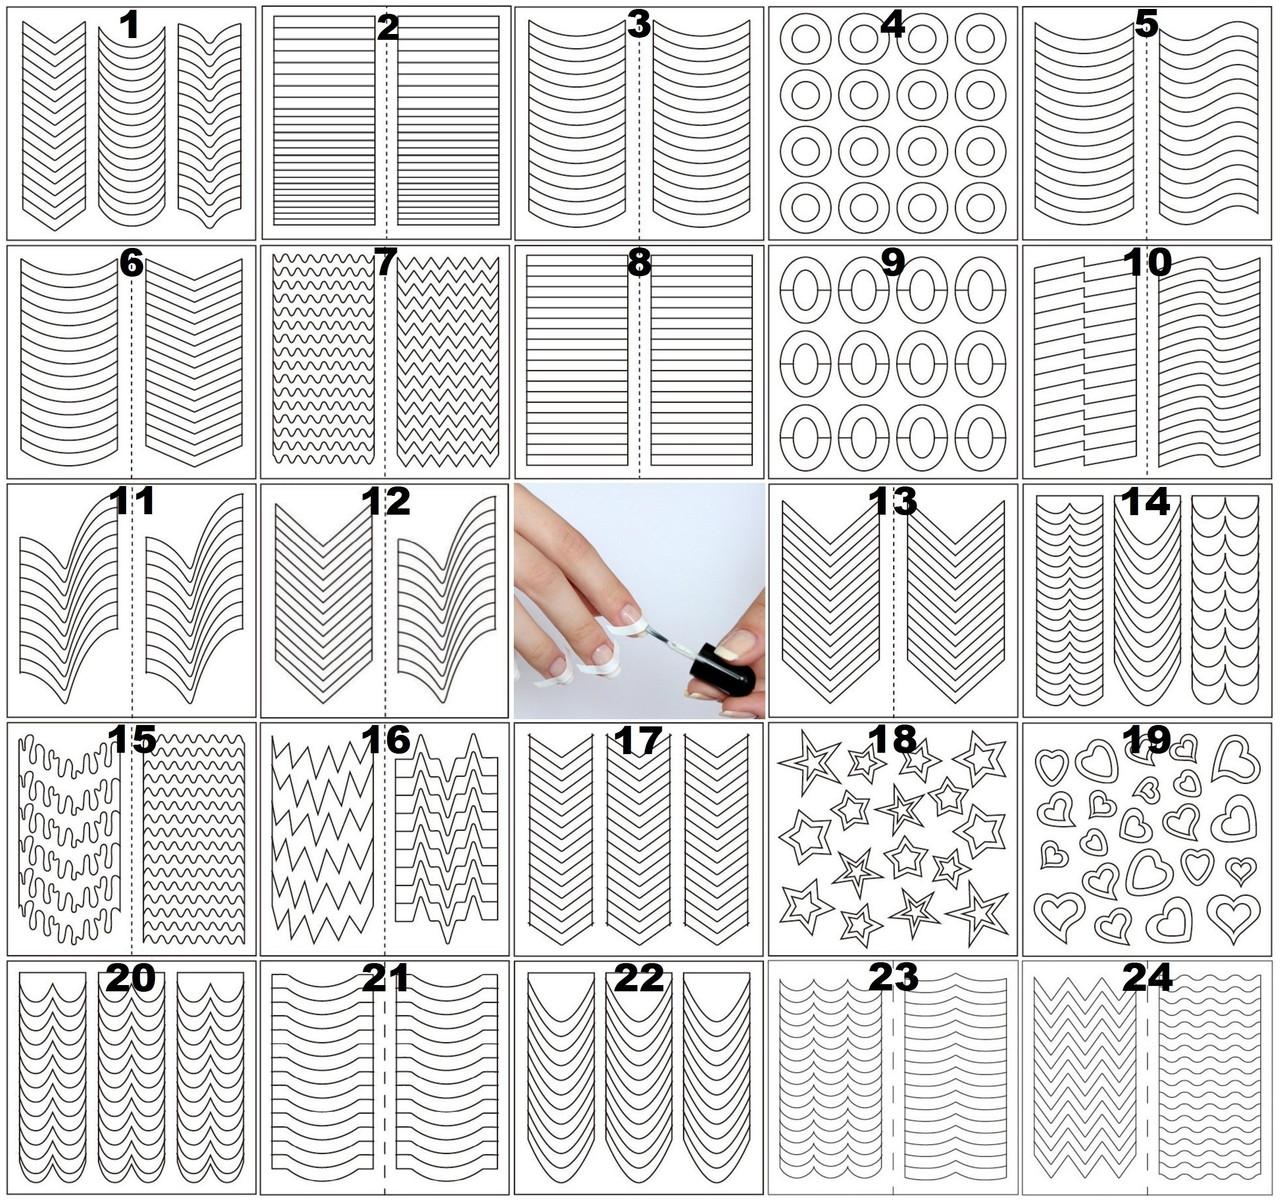 Набор наклеек для маникюра френча 24 вида